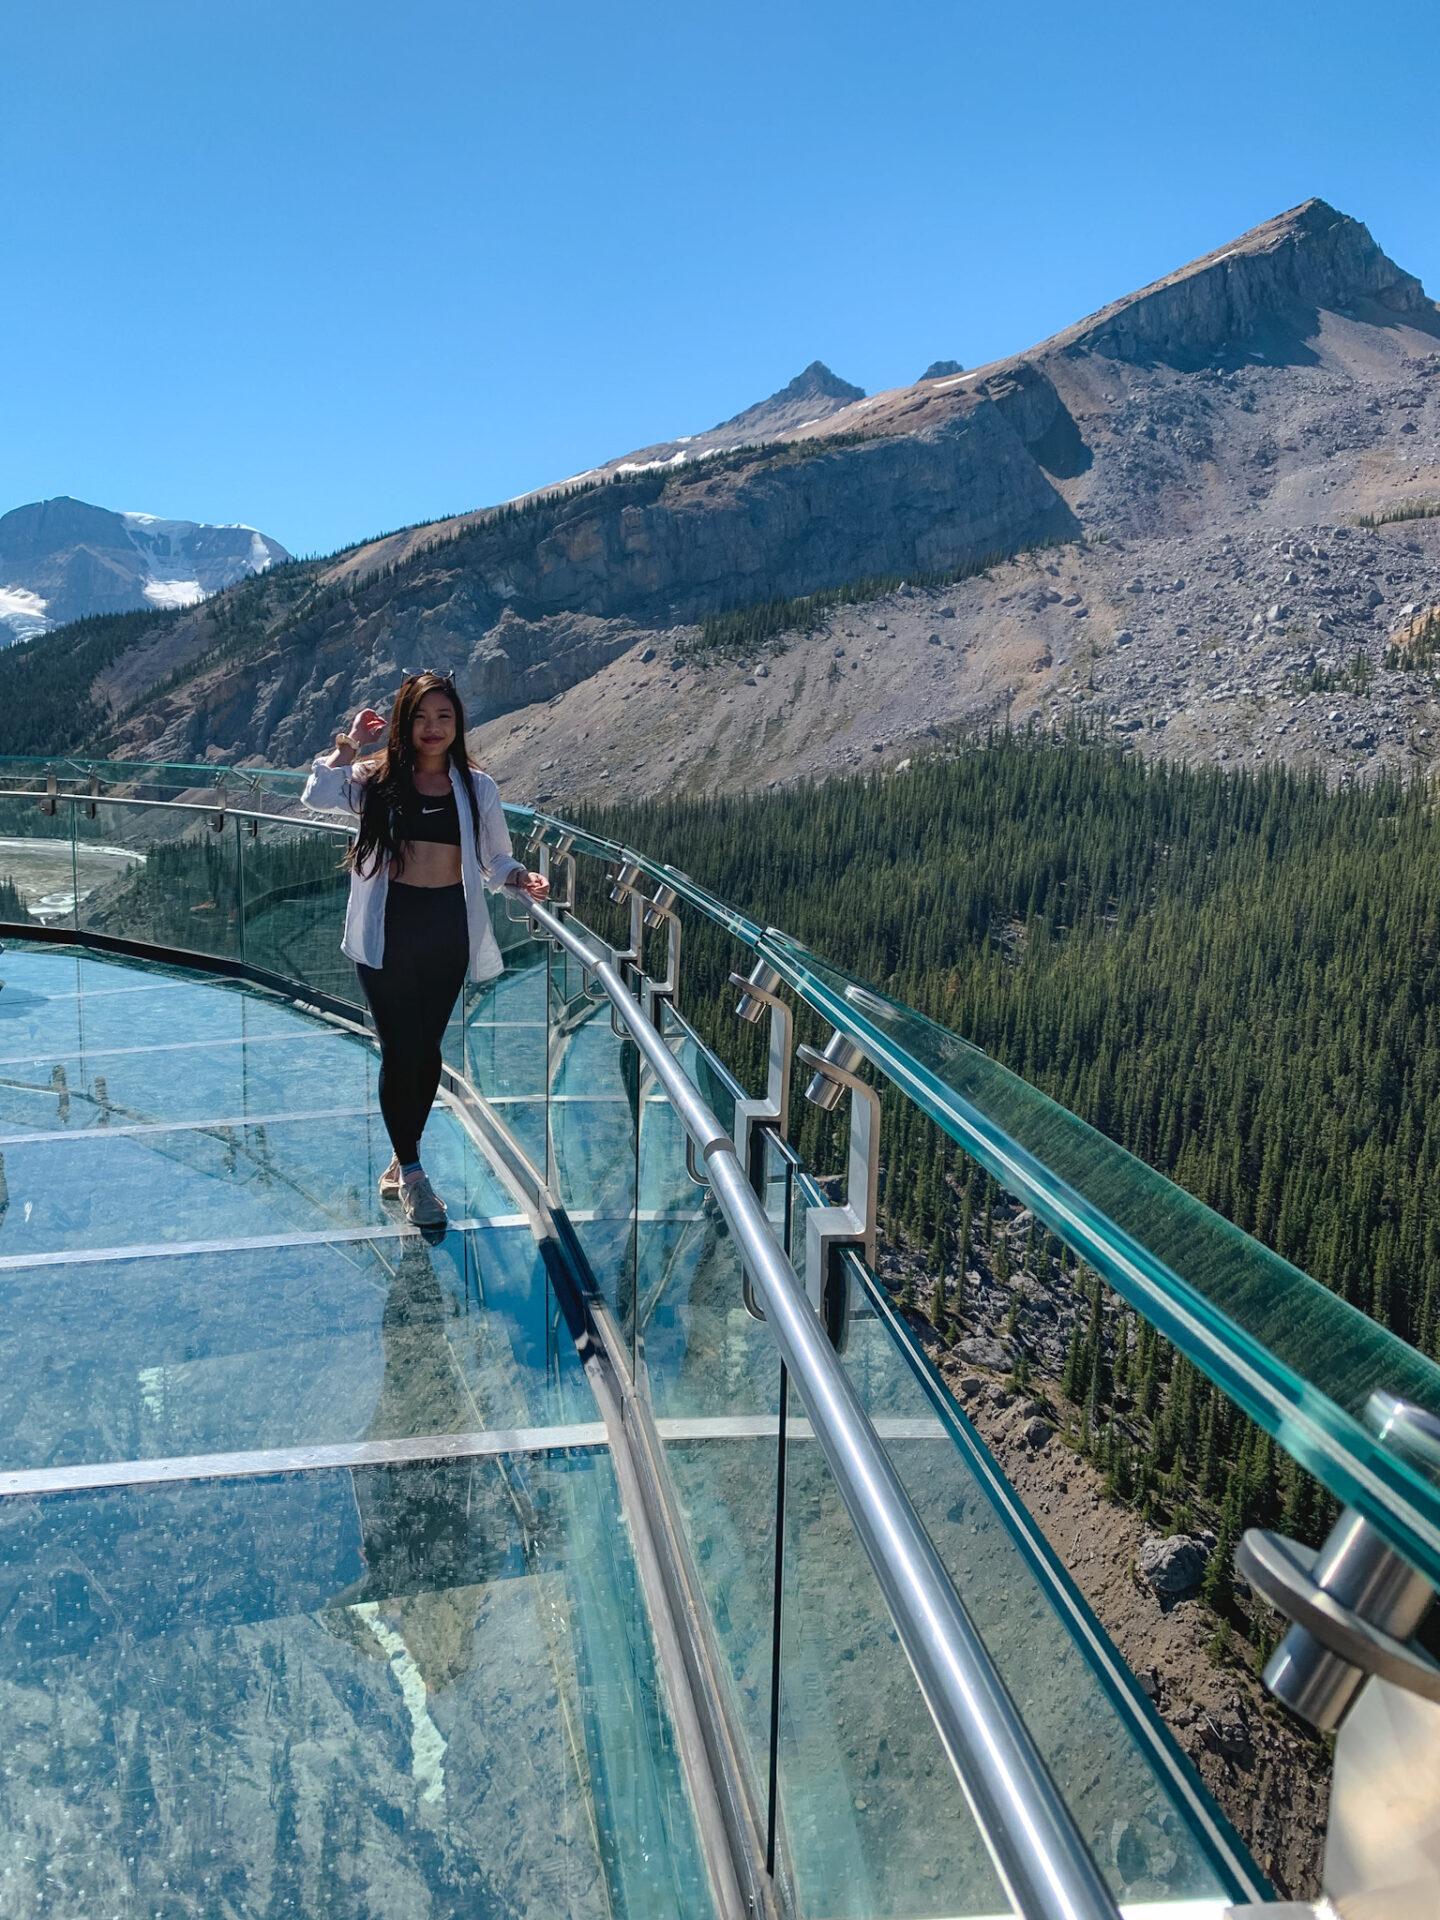 Glacier SkyWalk at Columbia Icefield Glacier Adventure in Jasper National Park, Alberta